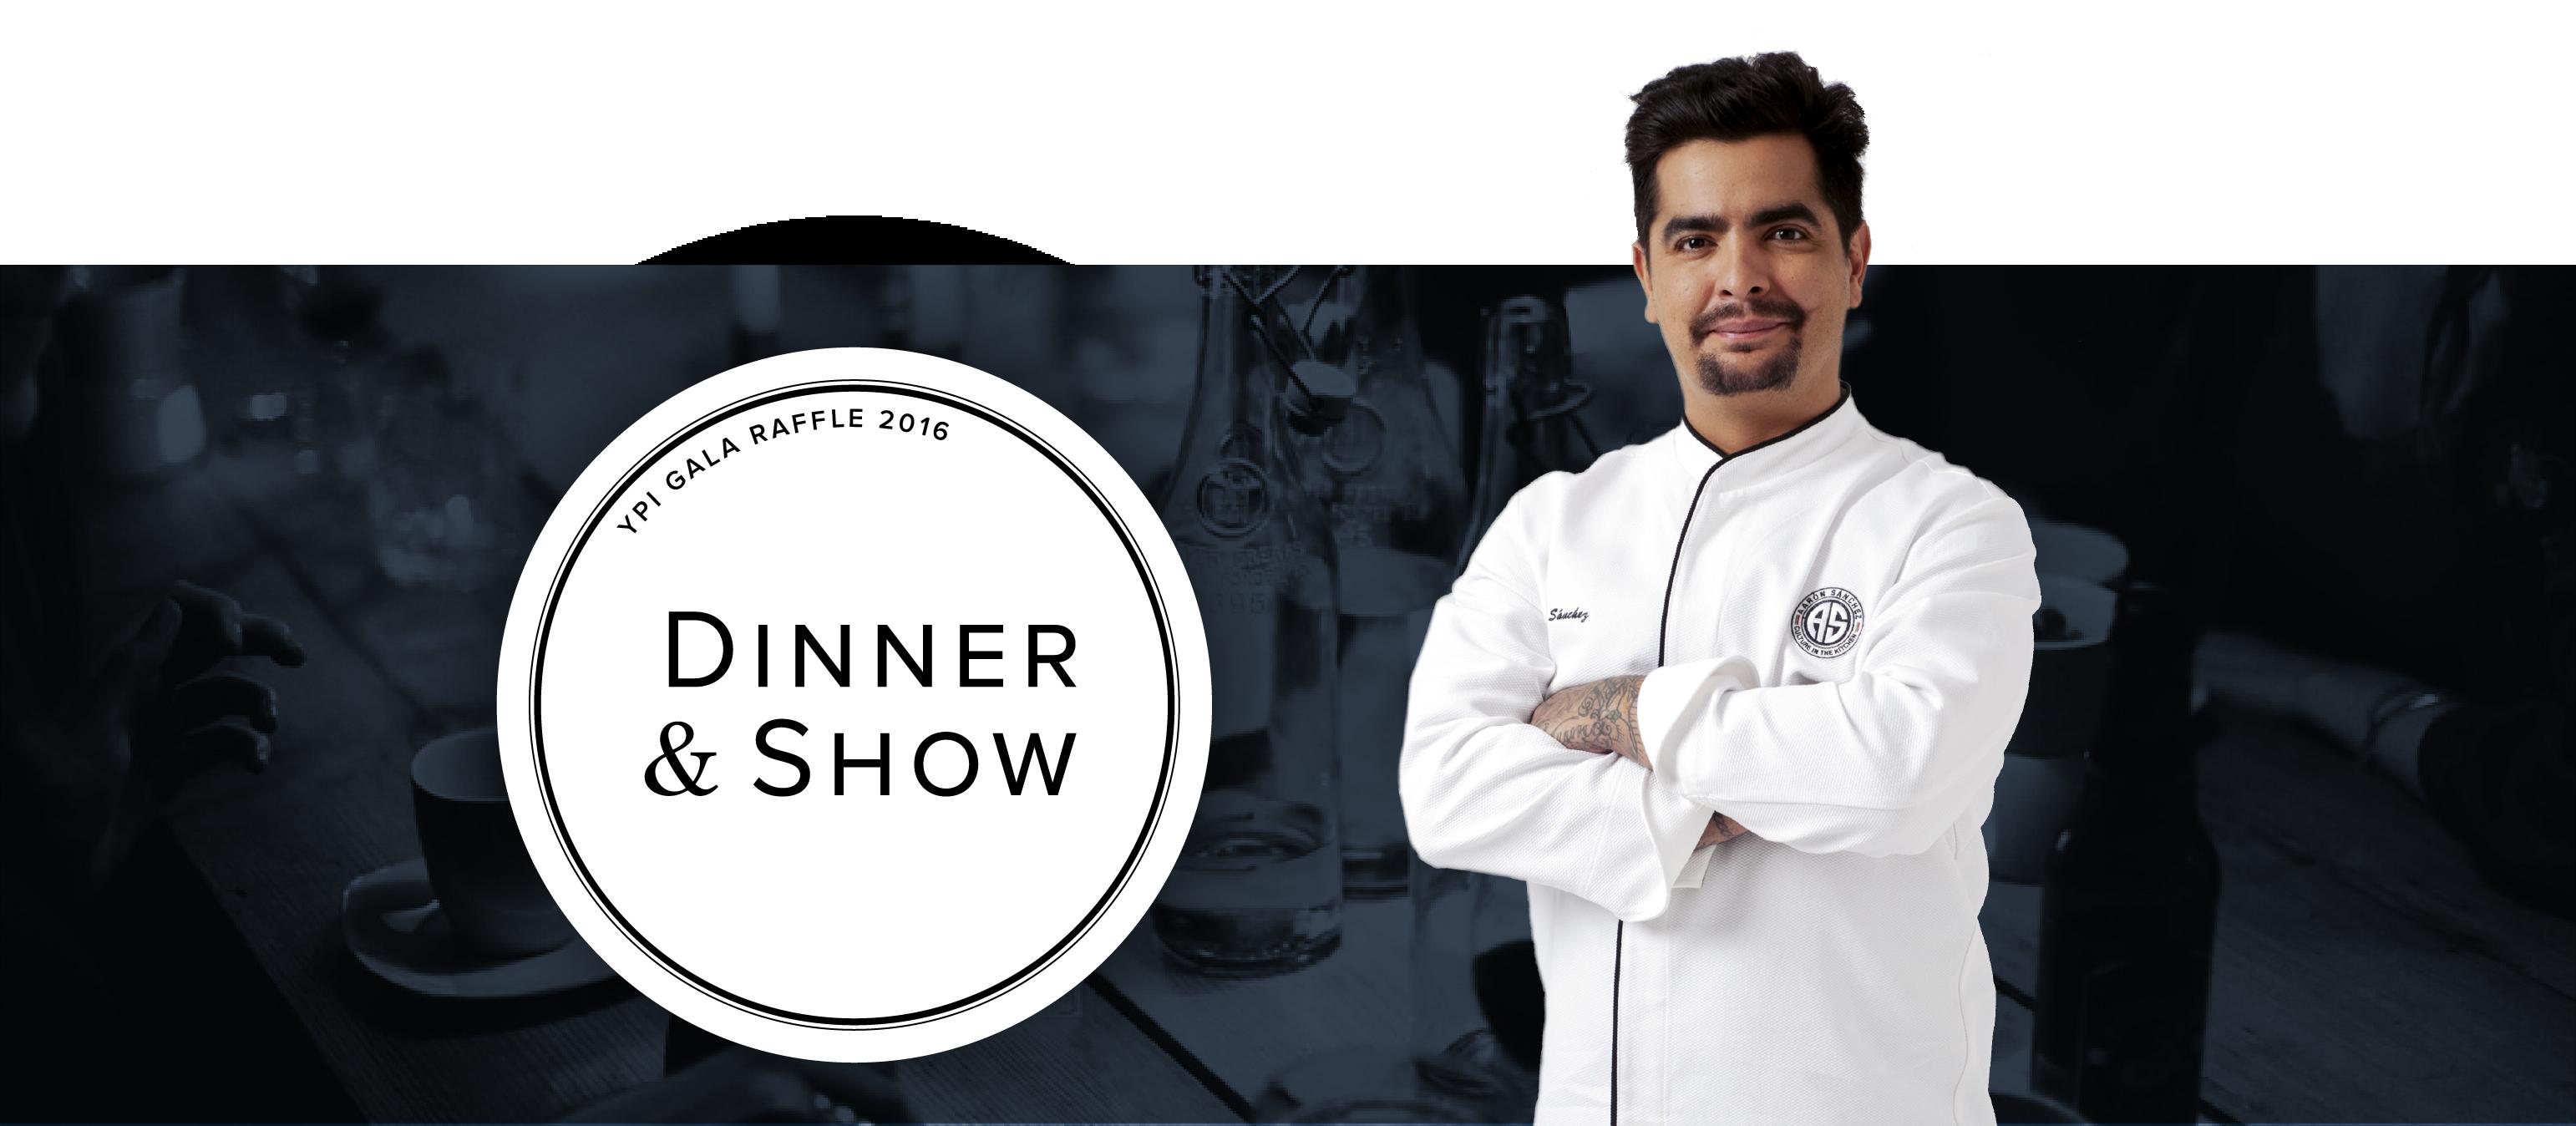 YPI Gala Raffle: Dinner & Show